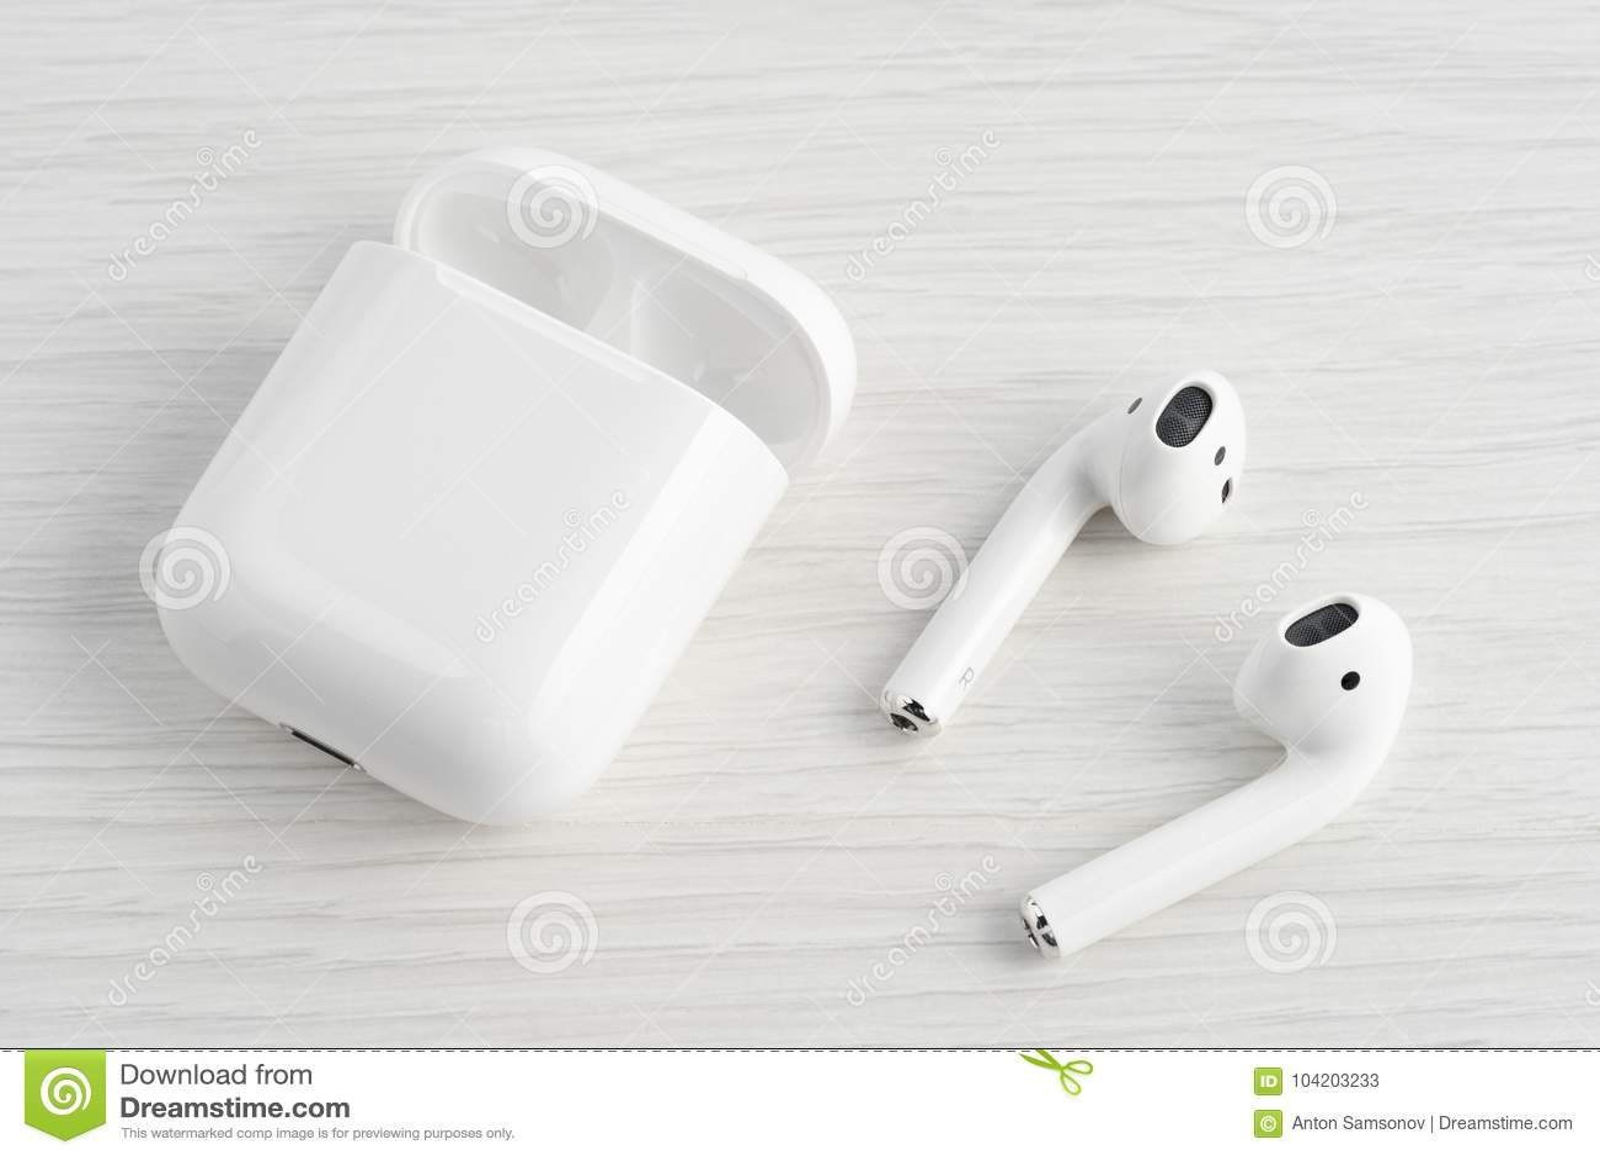 b75afea8b47 AirPods Wireless Bluetooth Headphones Editorial Stock Photo - Image ...